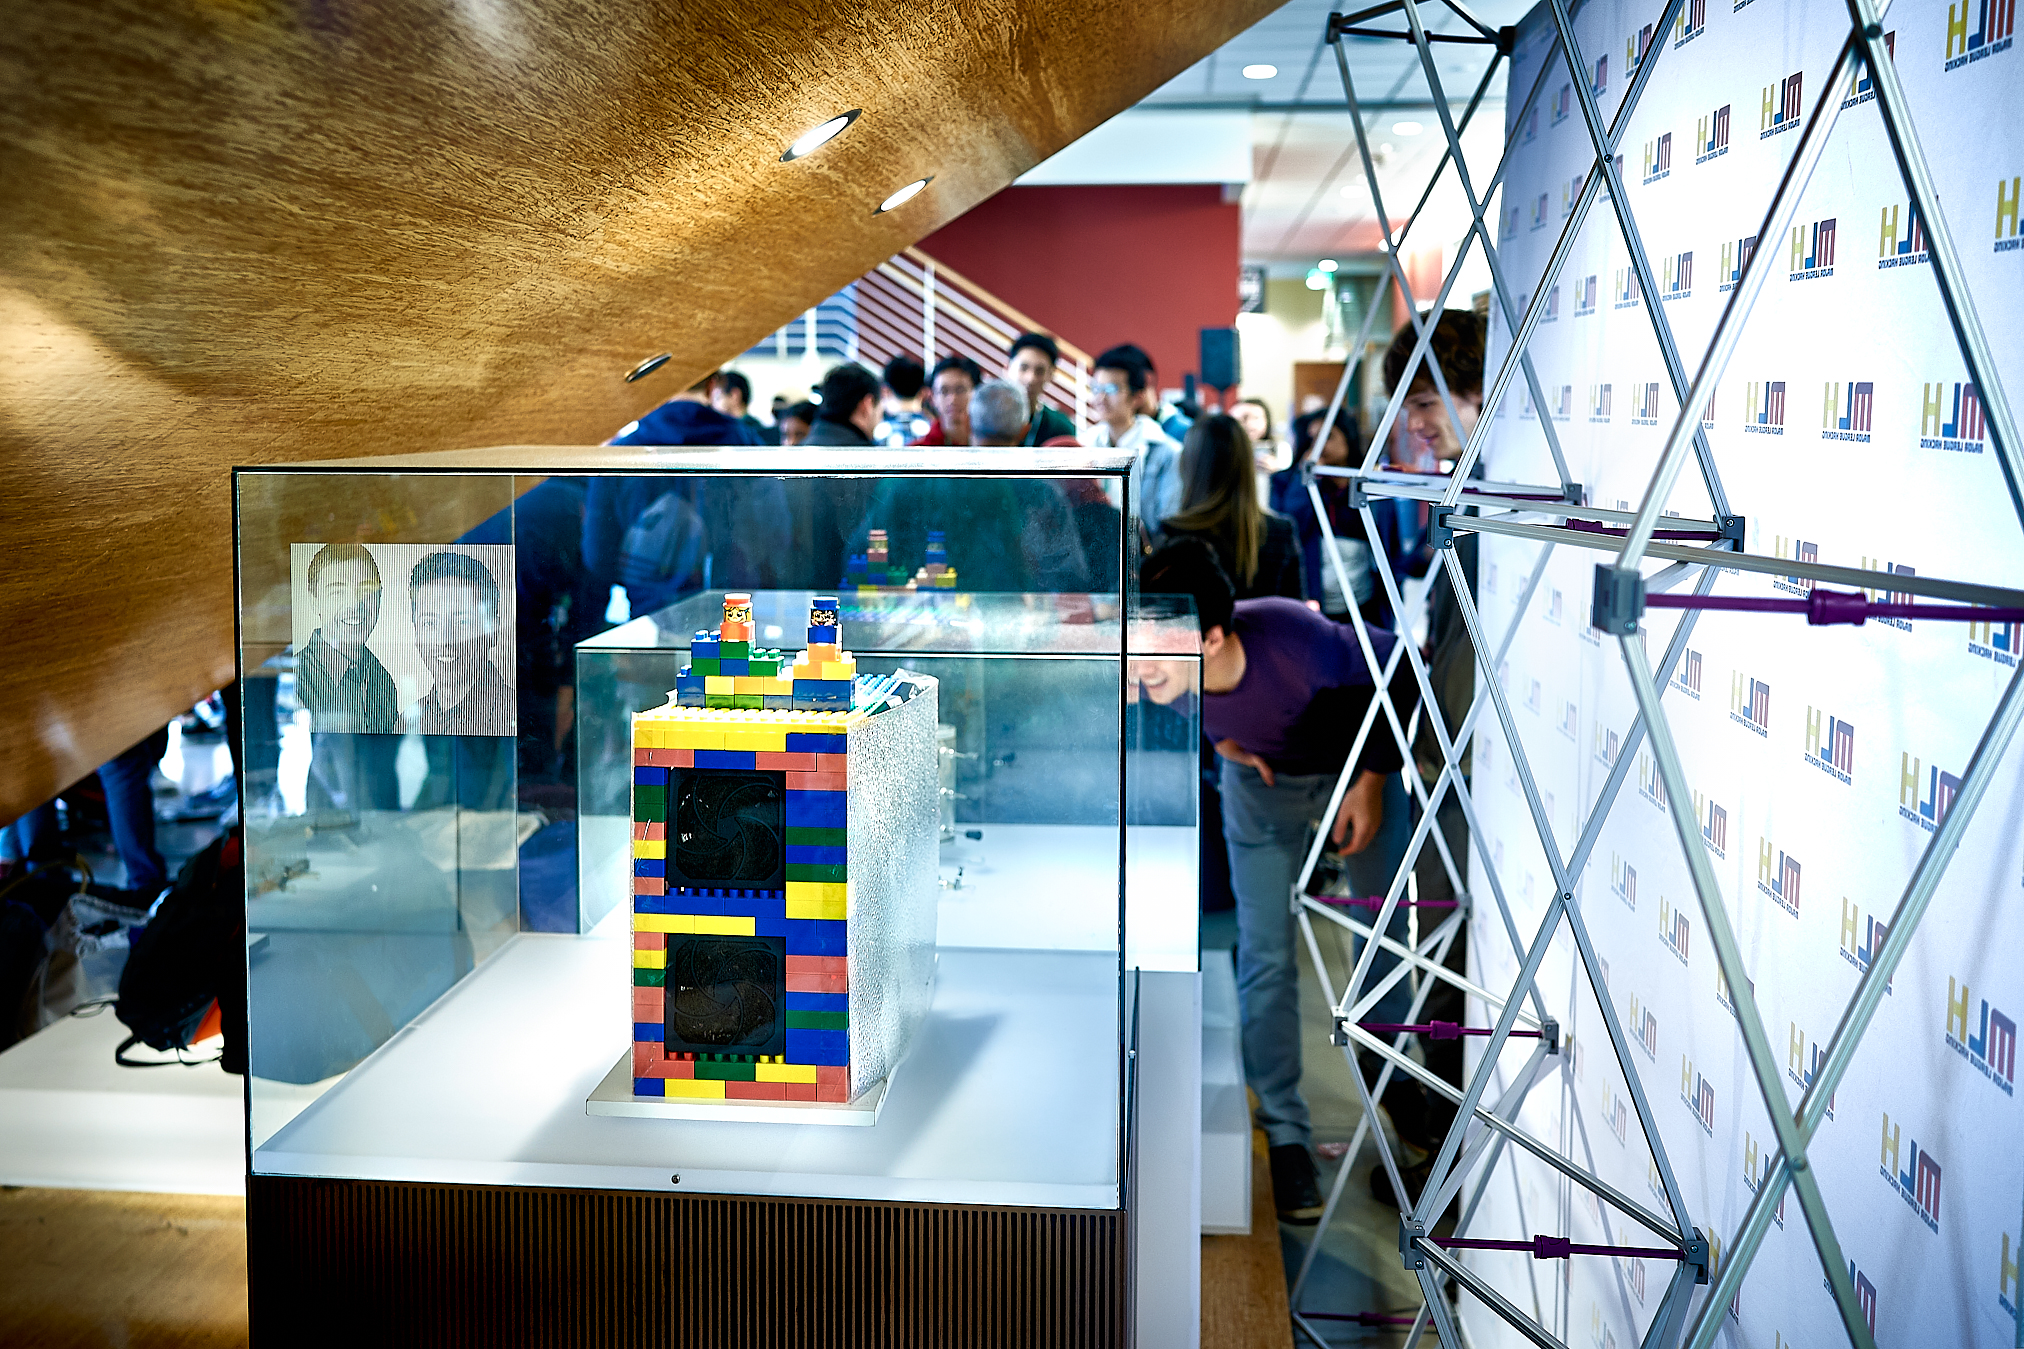 Lego Computer Server by Peter Adams.